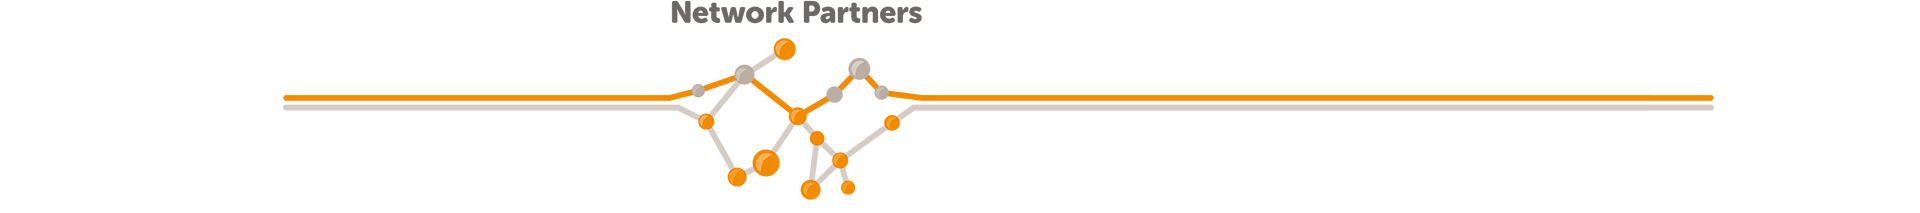 intromediates network partners